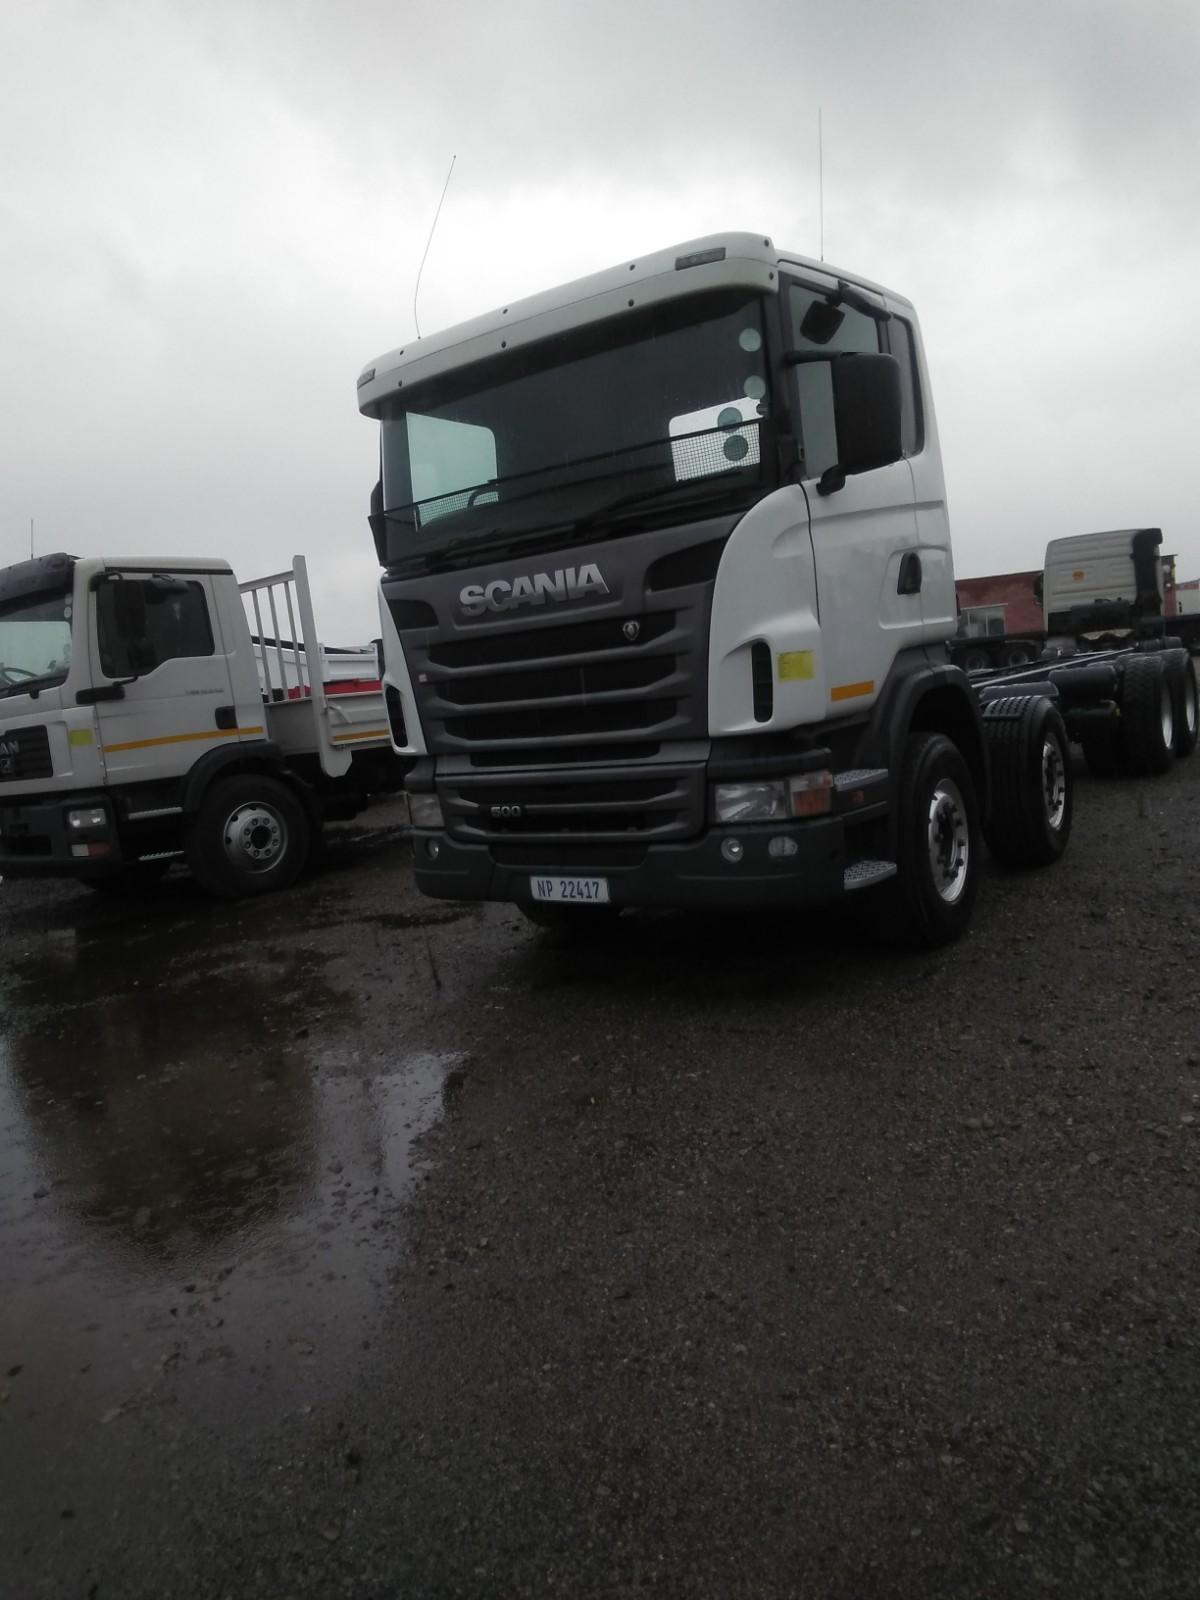 Trucks and Trailer